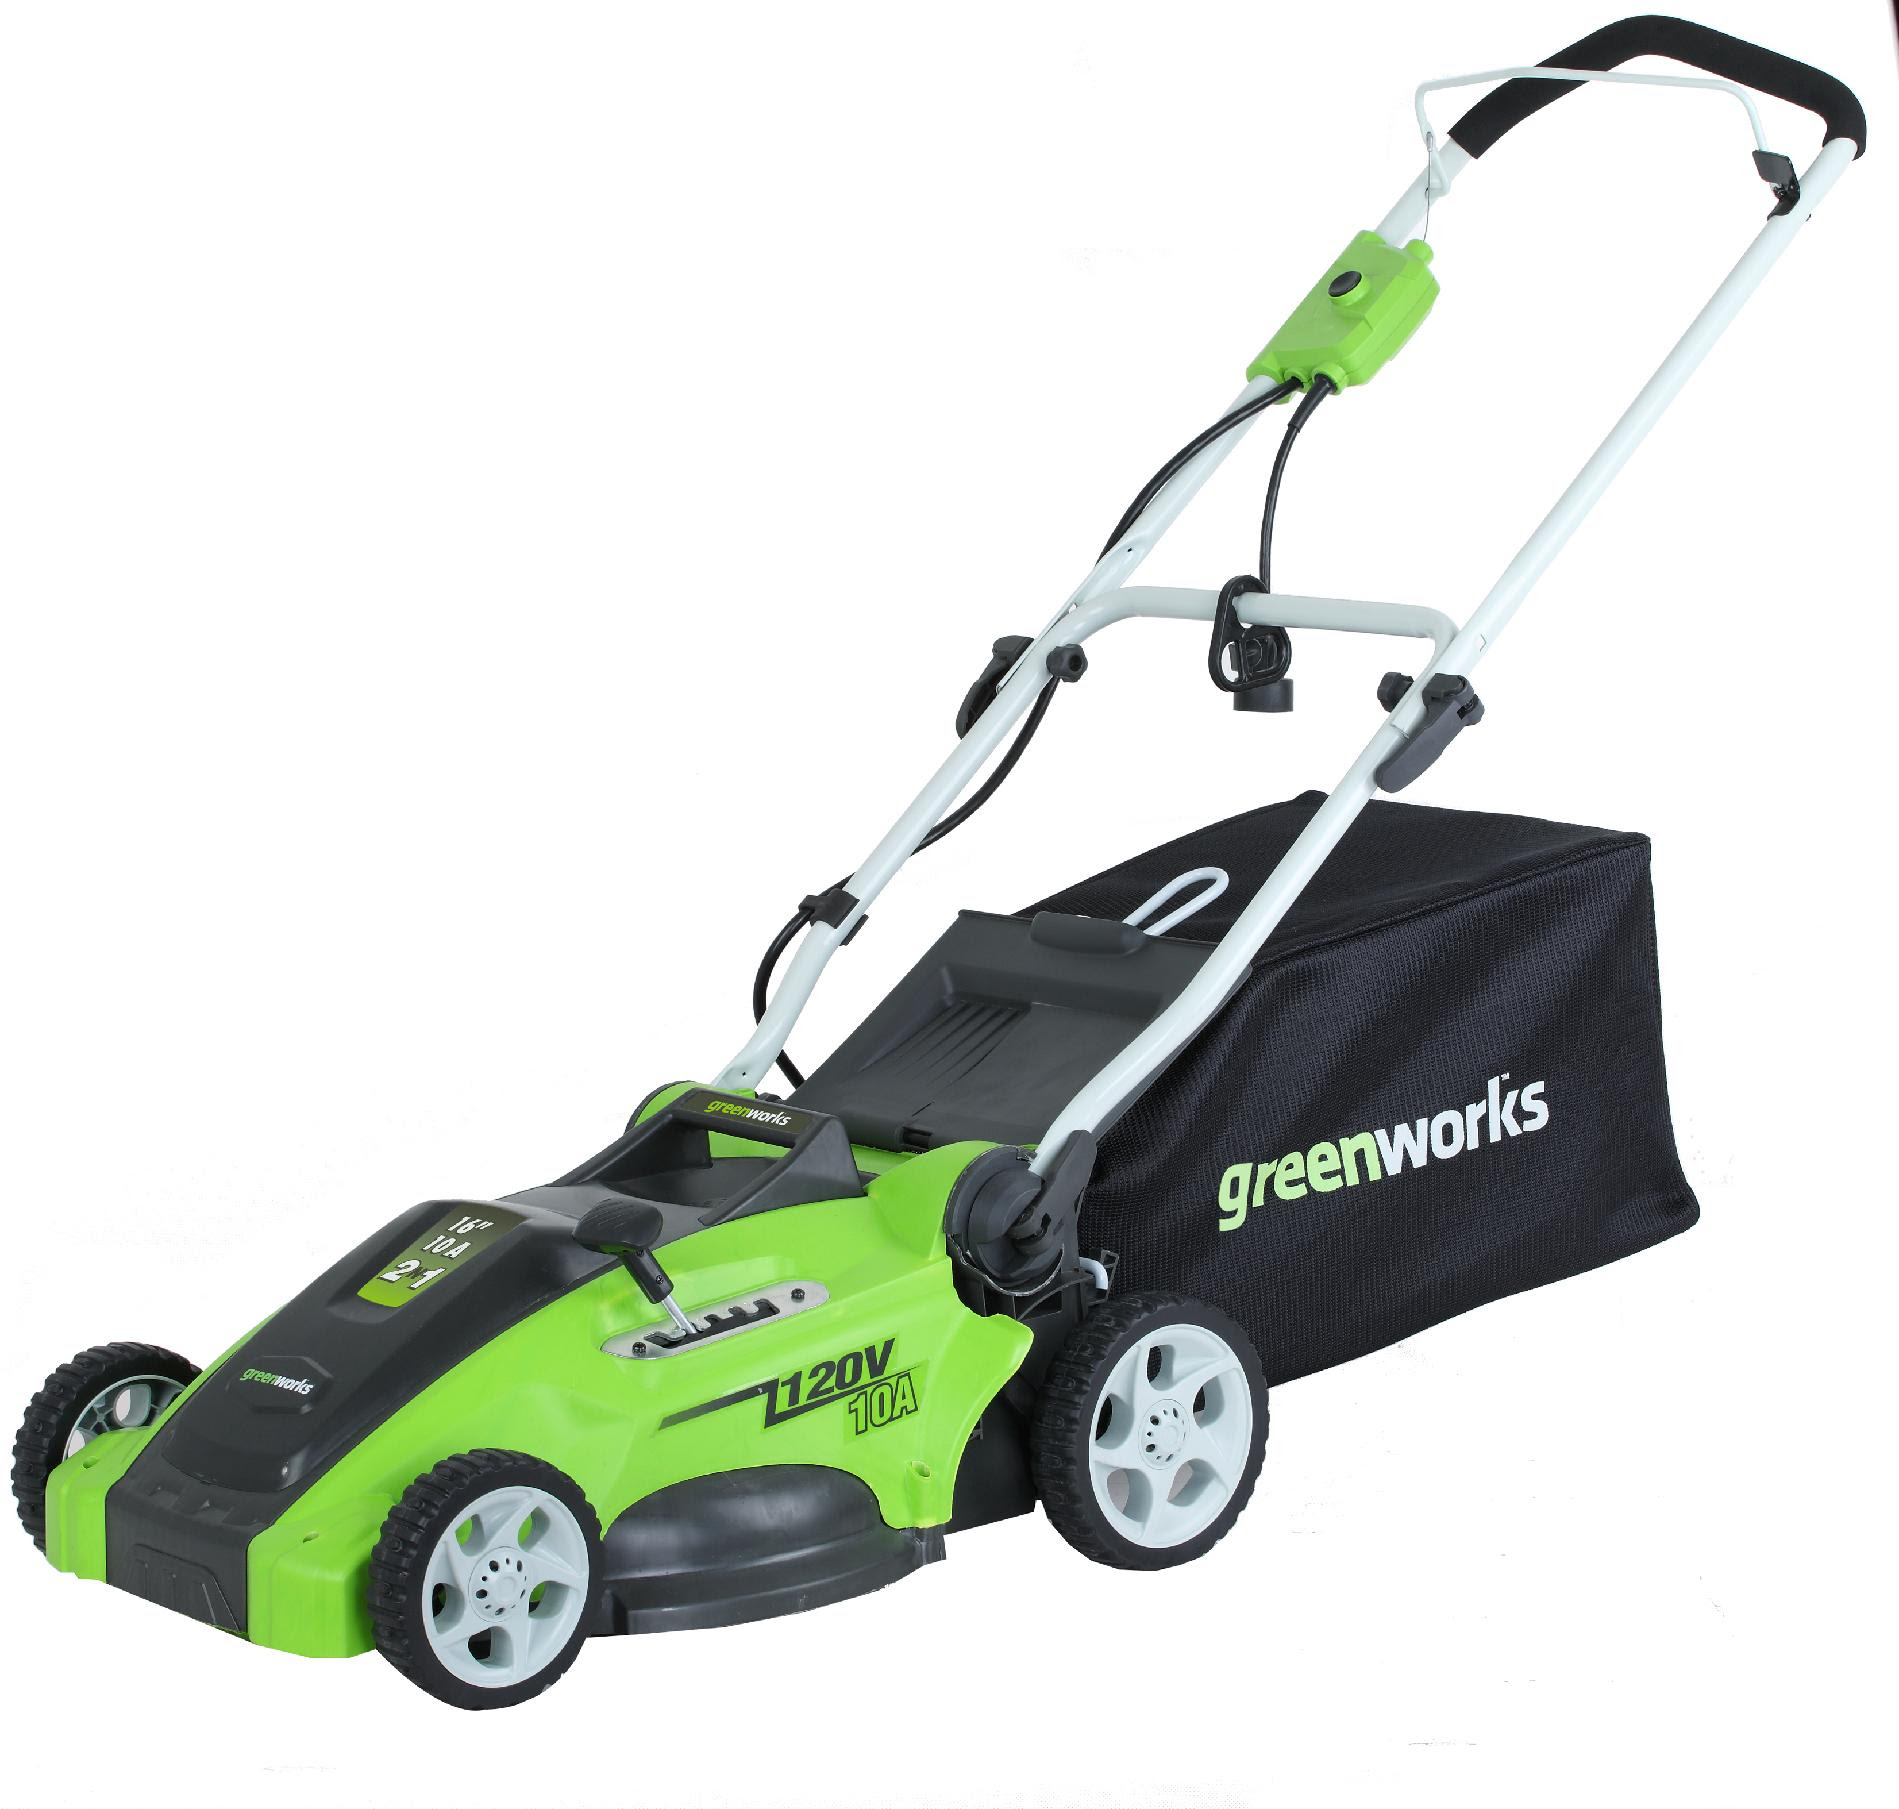 "UPC Greenworks 10 Amp Corded 16"" Mower"